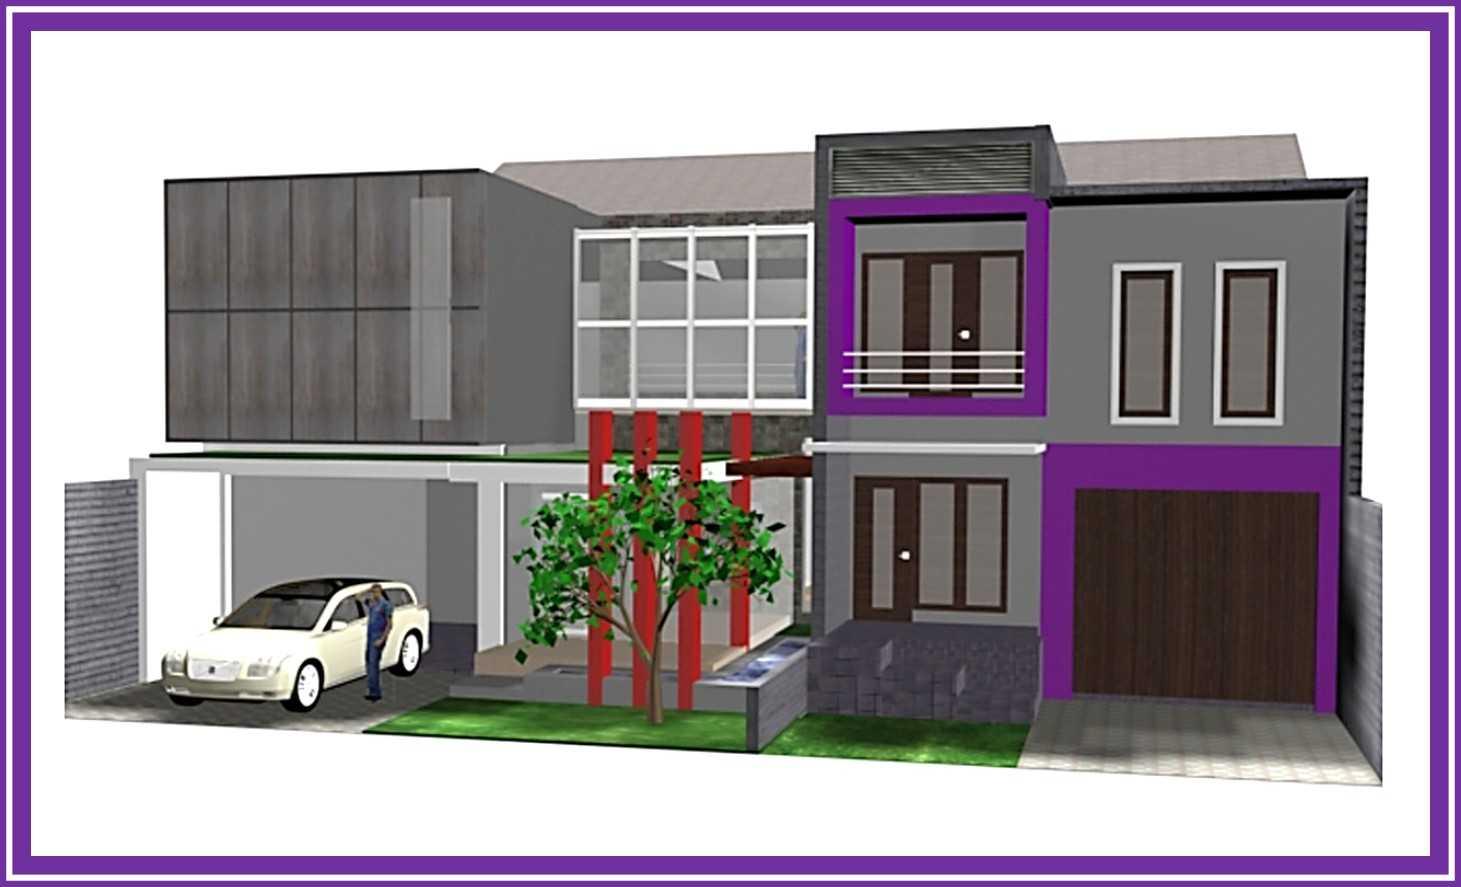 Ideall Design Rumah Junction Box Kec. Jagakarsa, Kota Jakarta Selatan, Daerah Khusus Ibukota Jakarta, Indonesia Kec. Jagakarsa, Kota Jakarta Selatan, Daerah Khusus Ibukota Jakarta, Indonesia Denah Lantai 1 & 2 Minimalist 114216